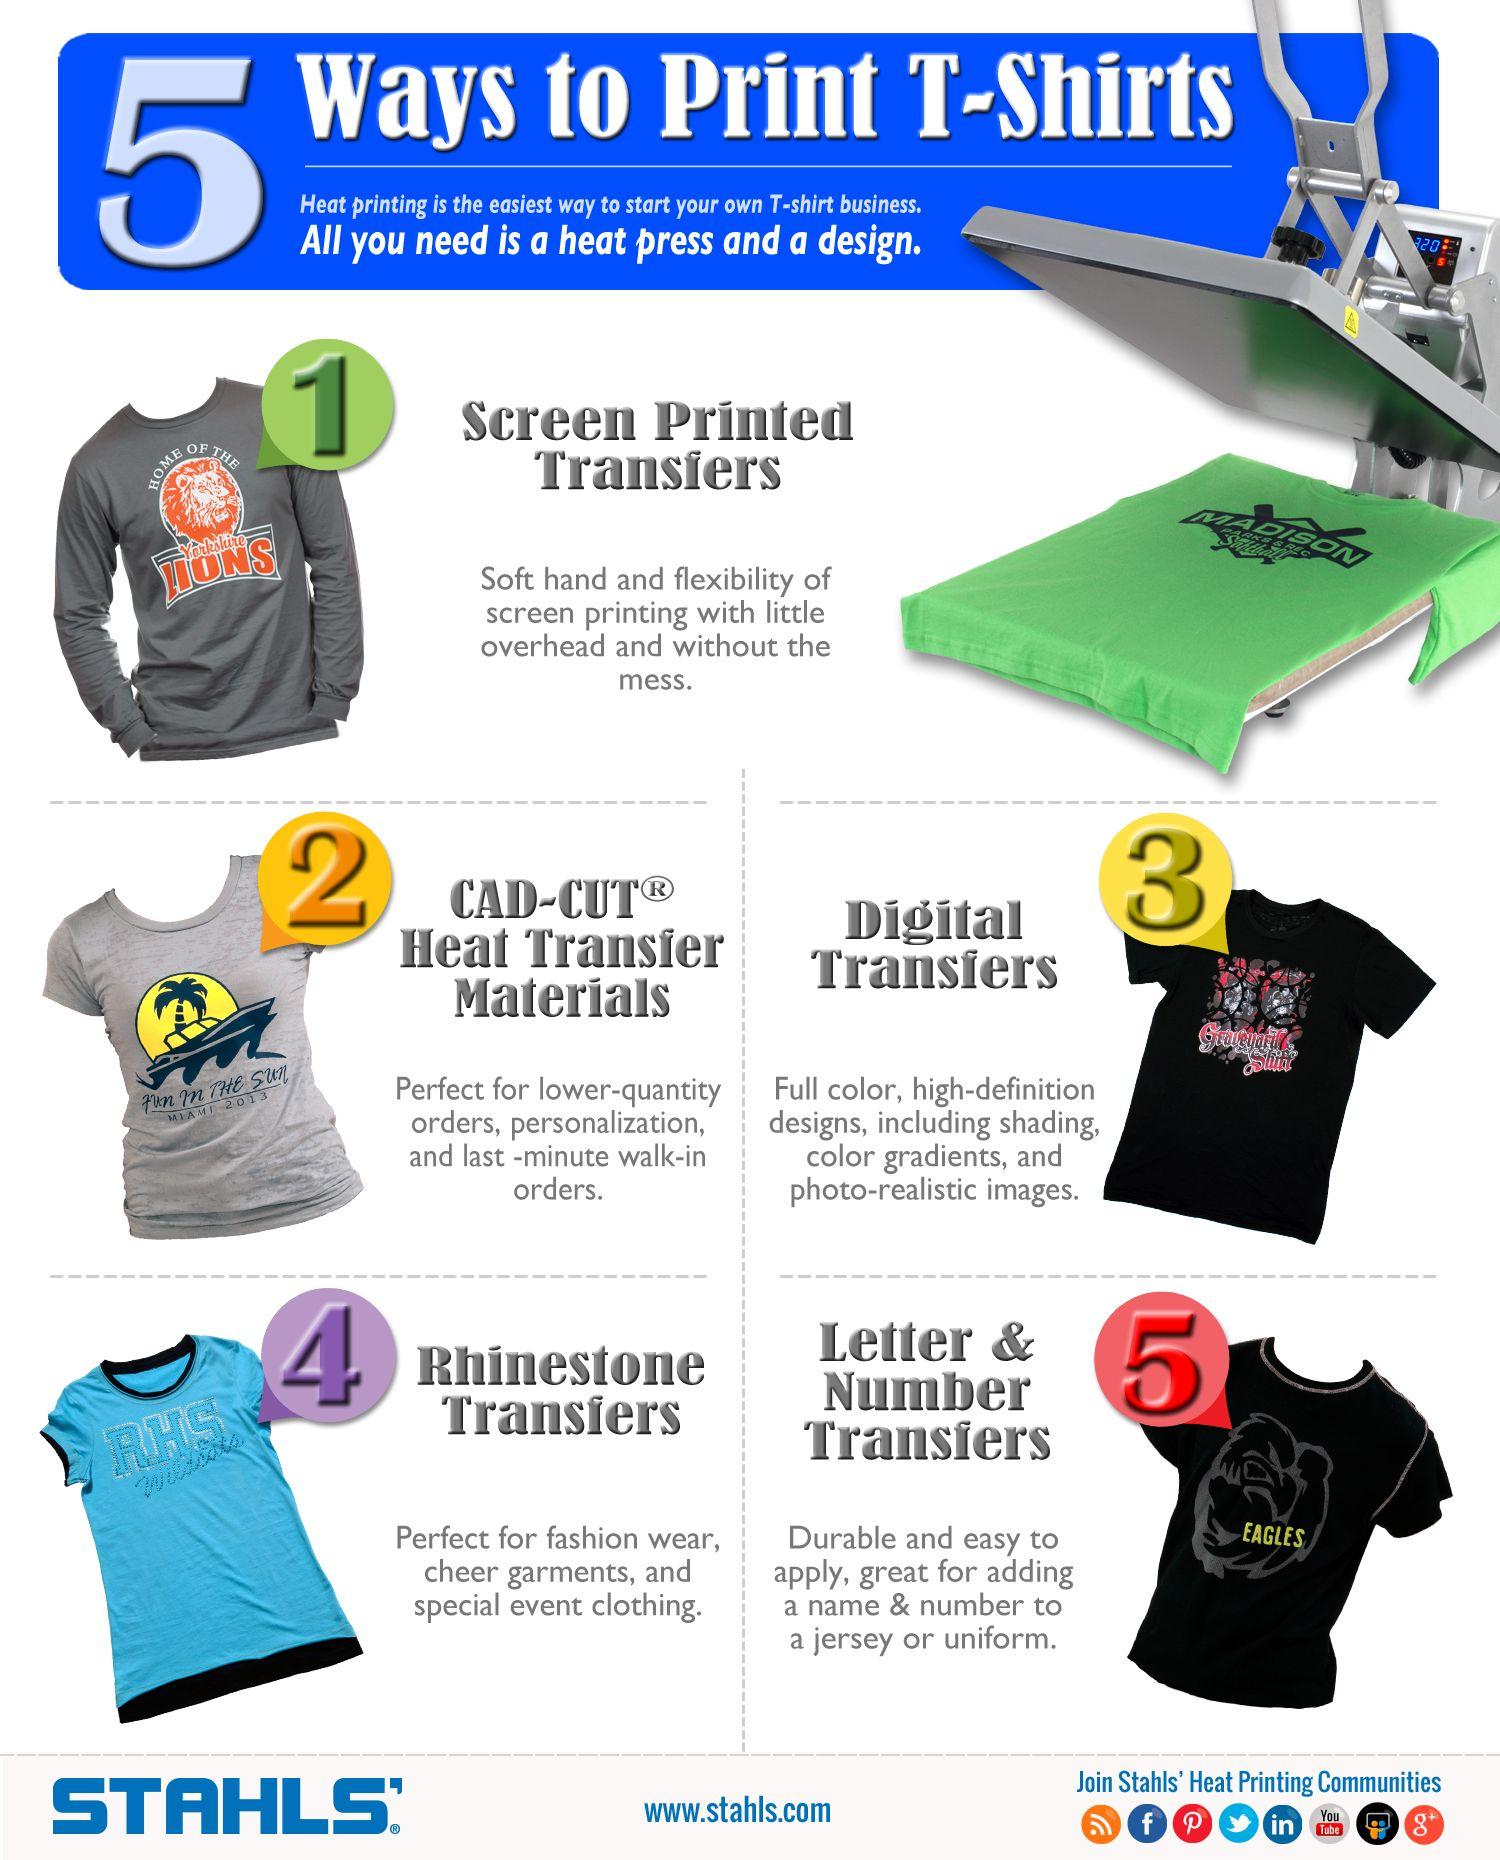 5 Ways To Print T Shirts With A Heat Press